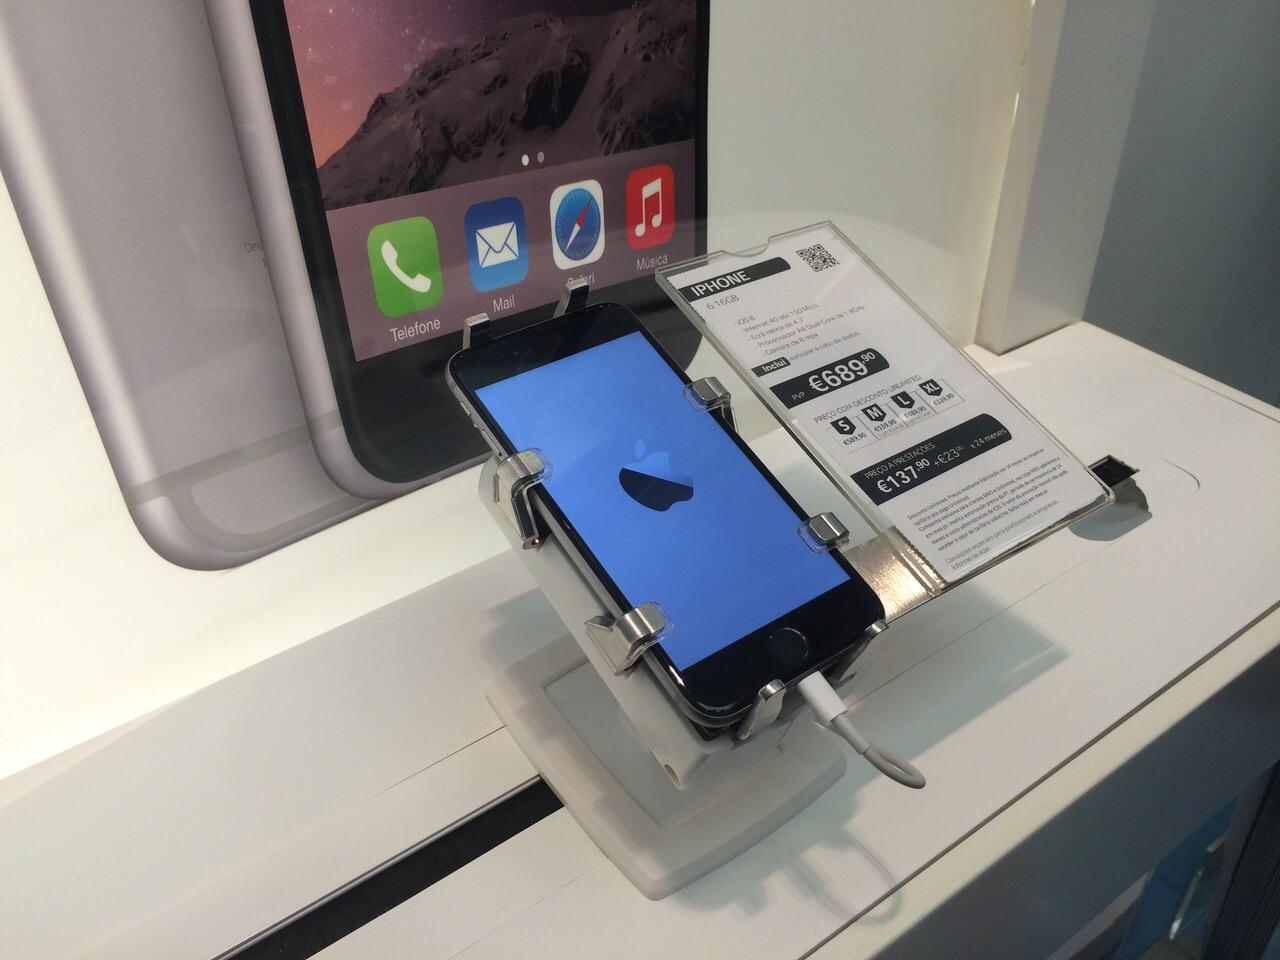 gripzo-secures-iphone-6-apple-logo-screen-.jpg